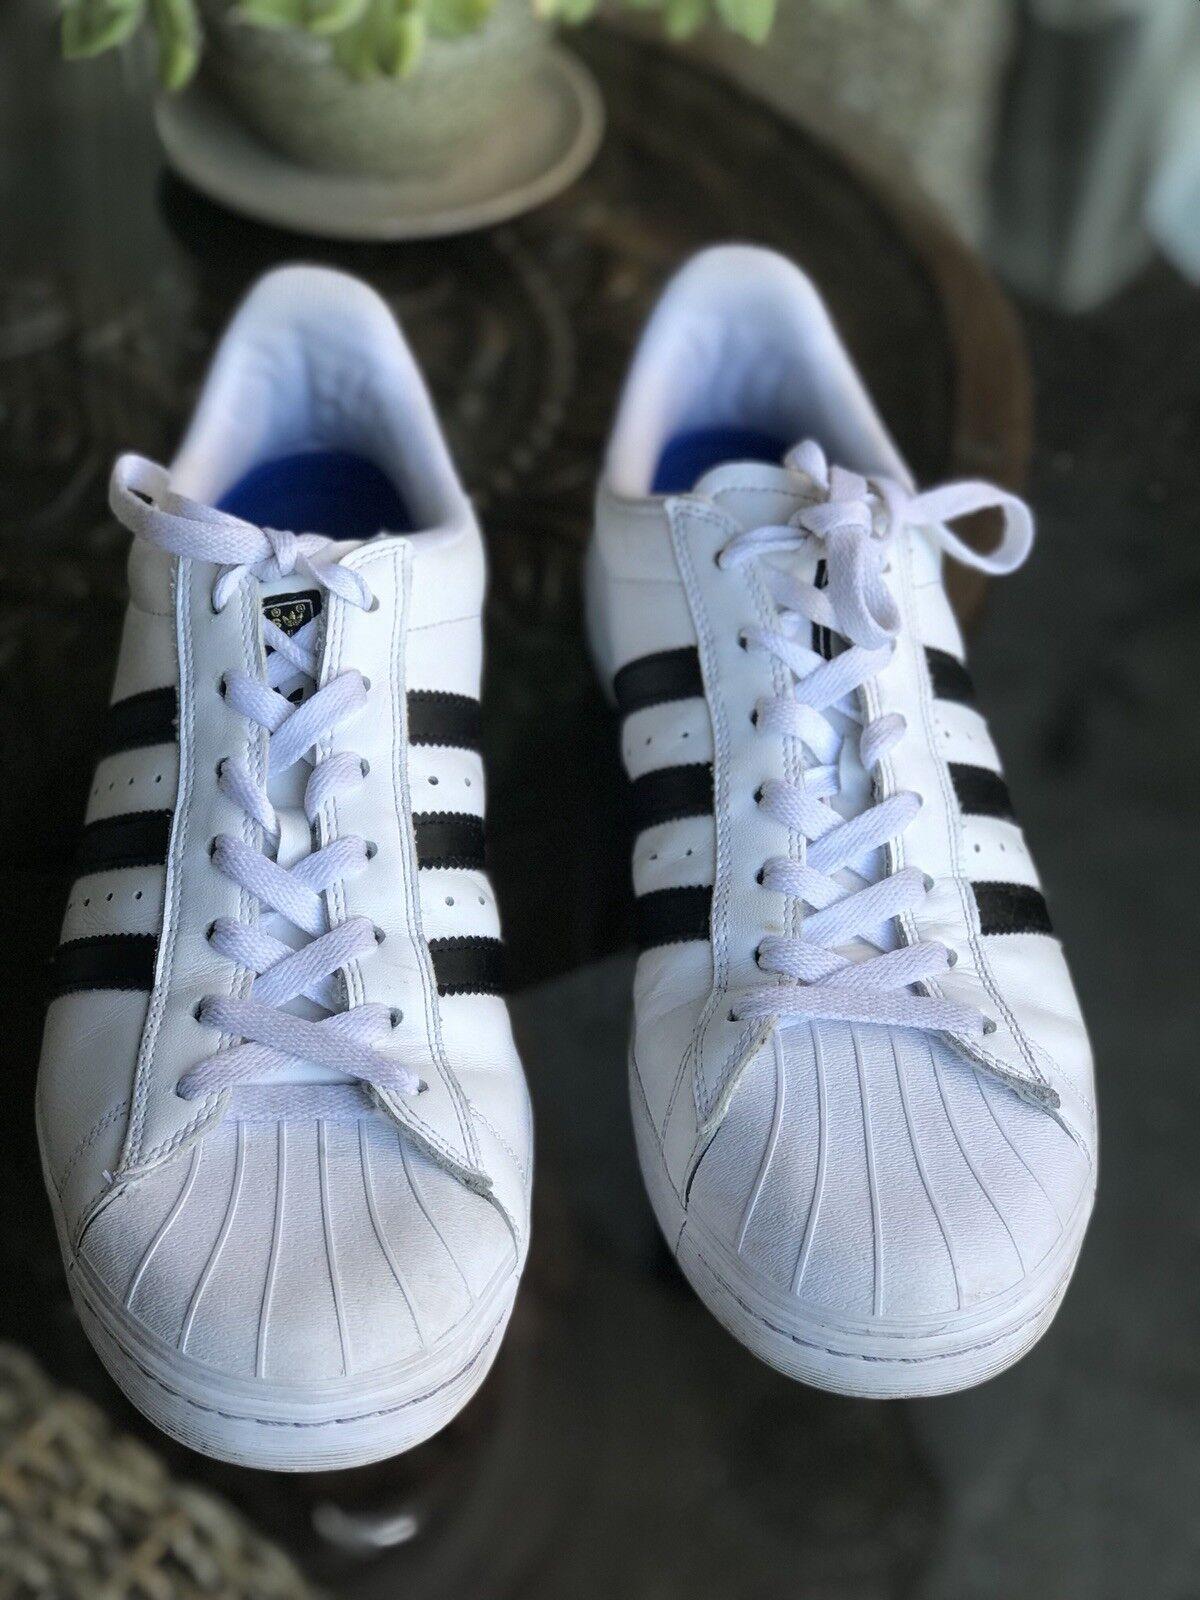 Con Nero Lo Strisce Rodcbex Skate Scarpe 3 Adidas Bianco 35qL4ARj